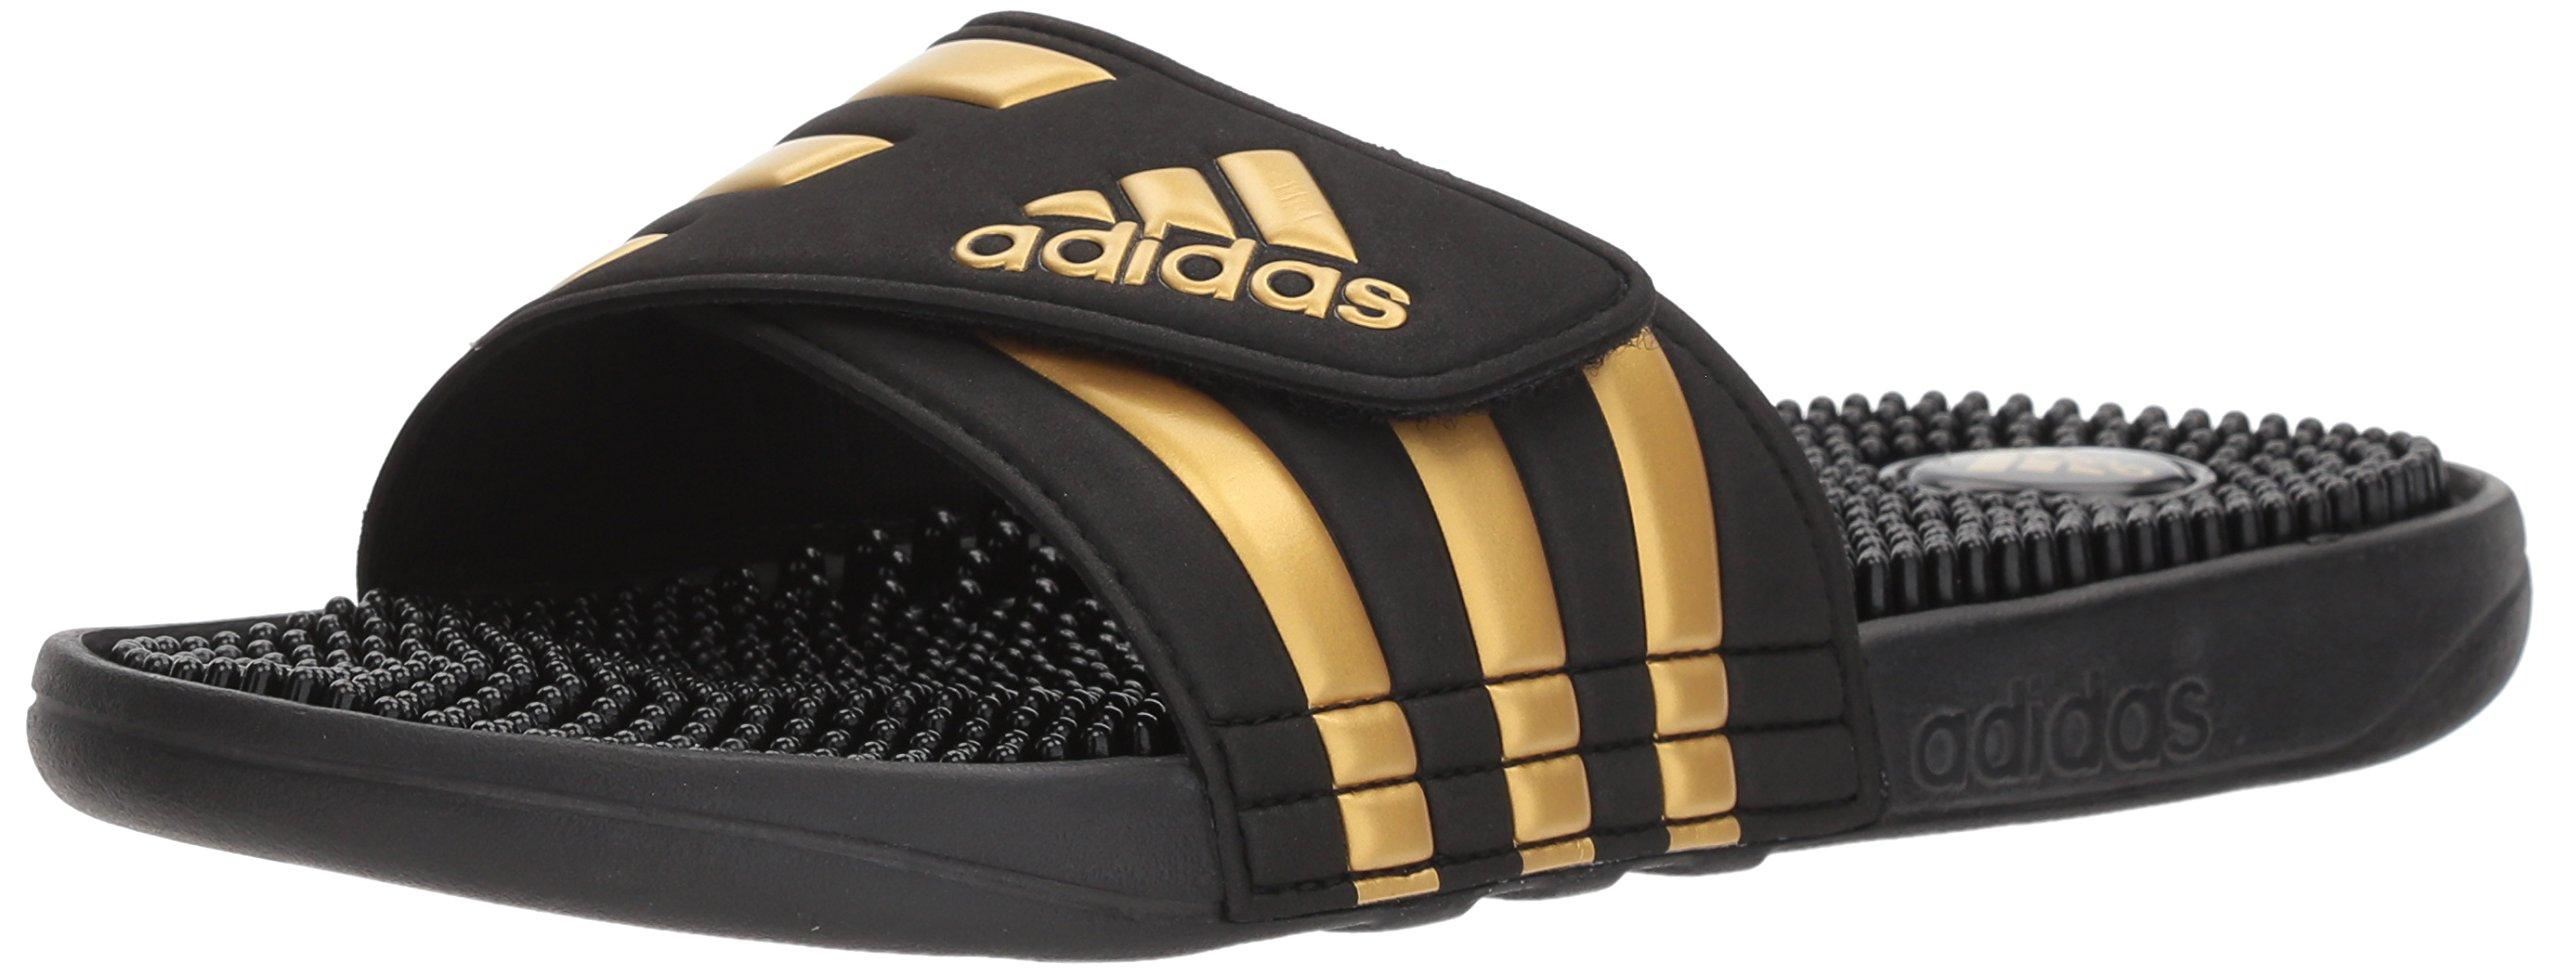 1759f69c435a61 Get Quotations · adidas Men s Adissage Slide Sandal